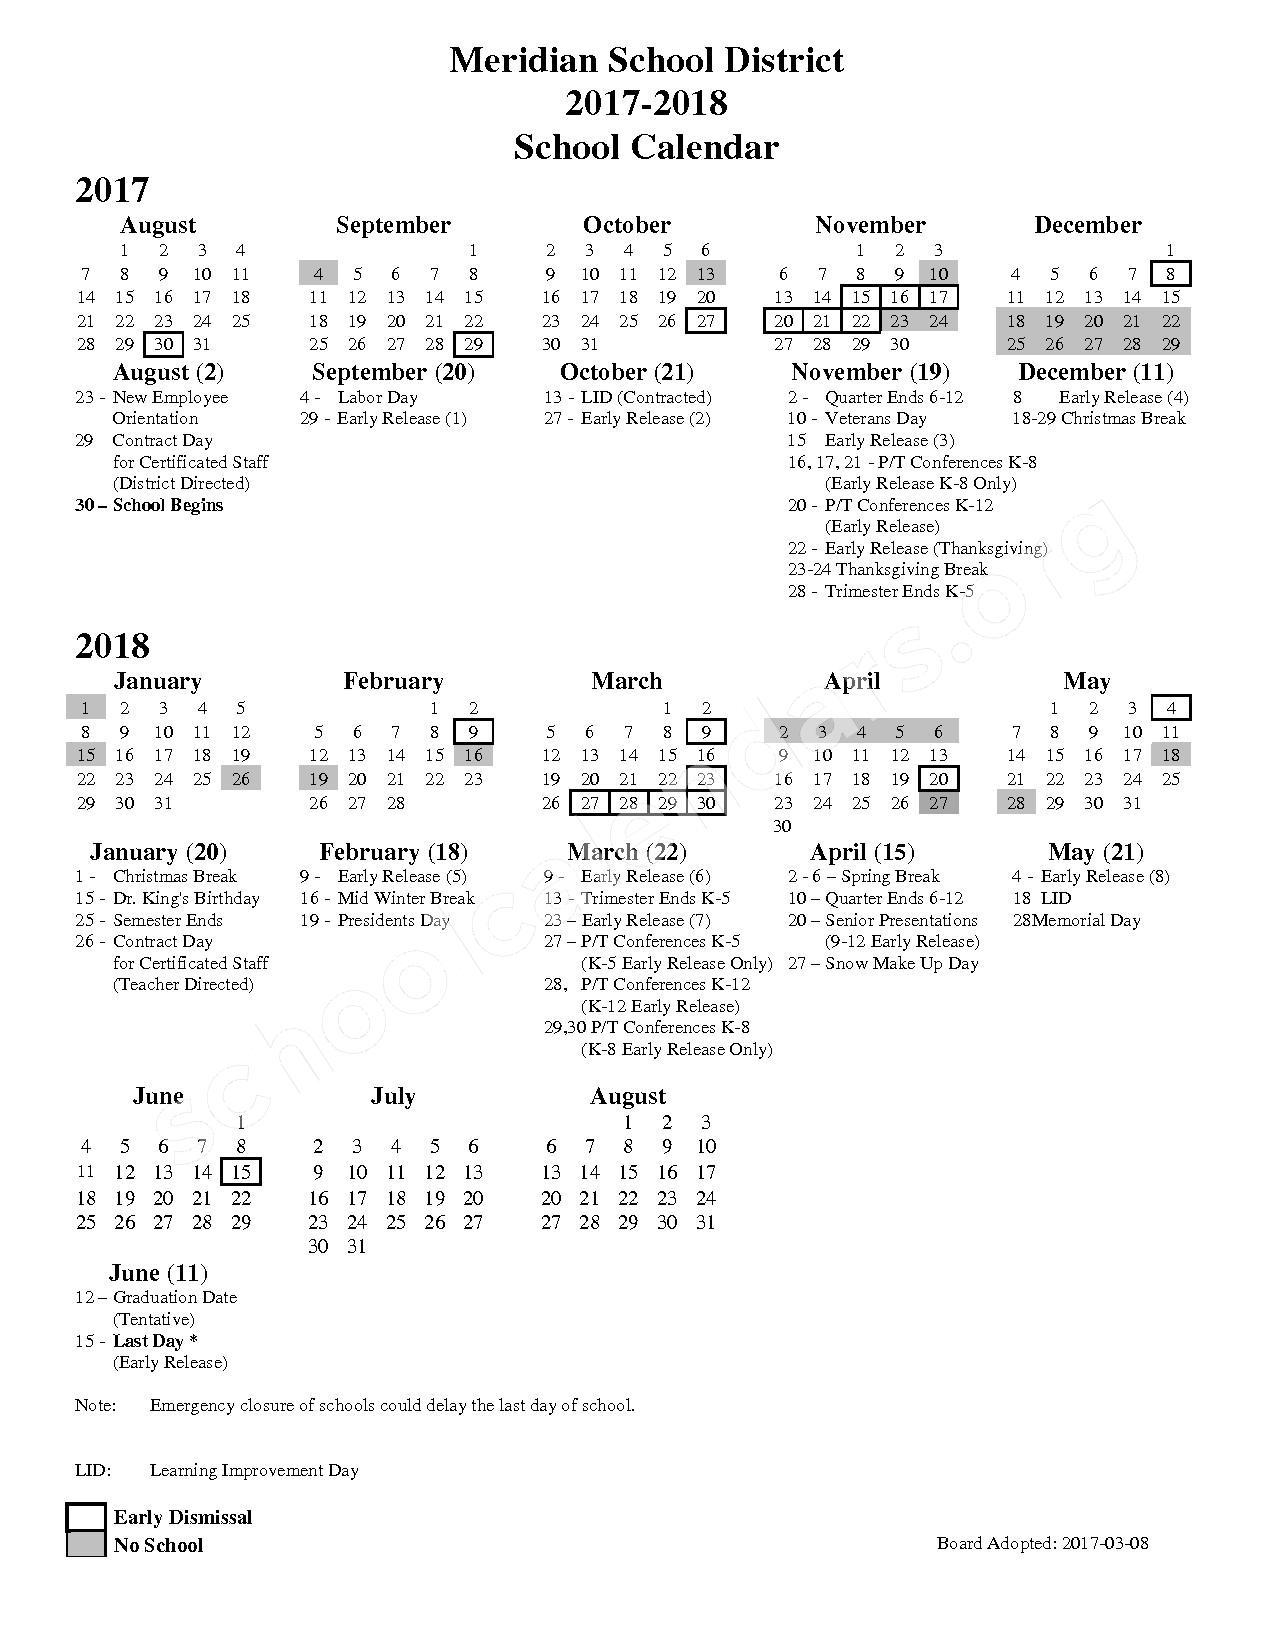 2017 - 2018 School Calendar – Meridian School District – page 1